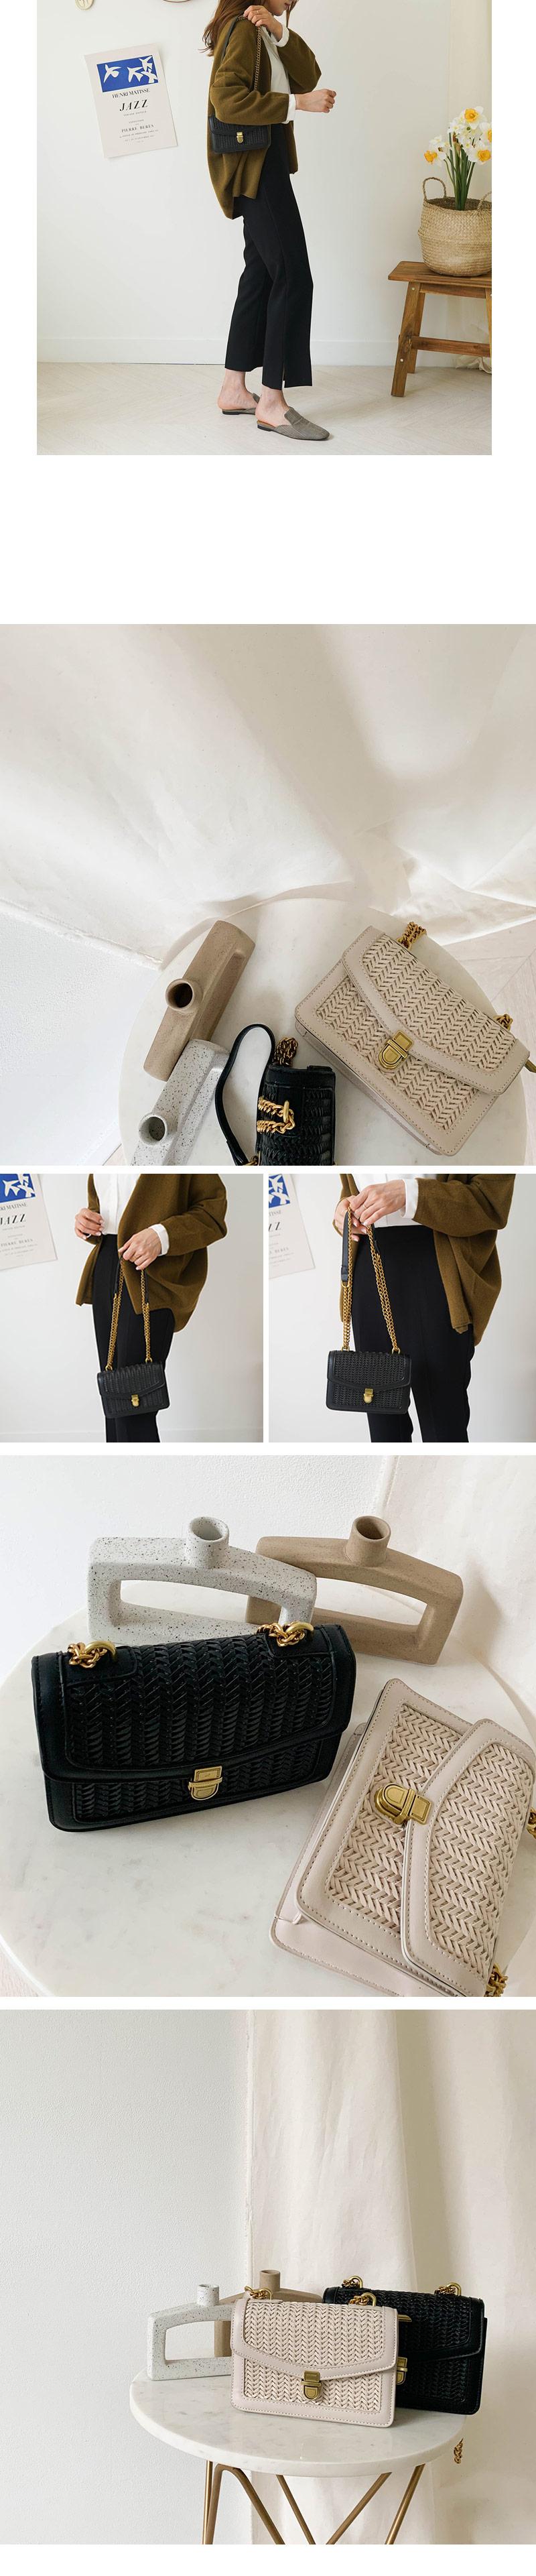 bag009c96_04.jpg